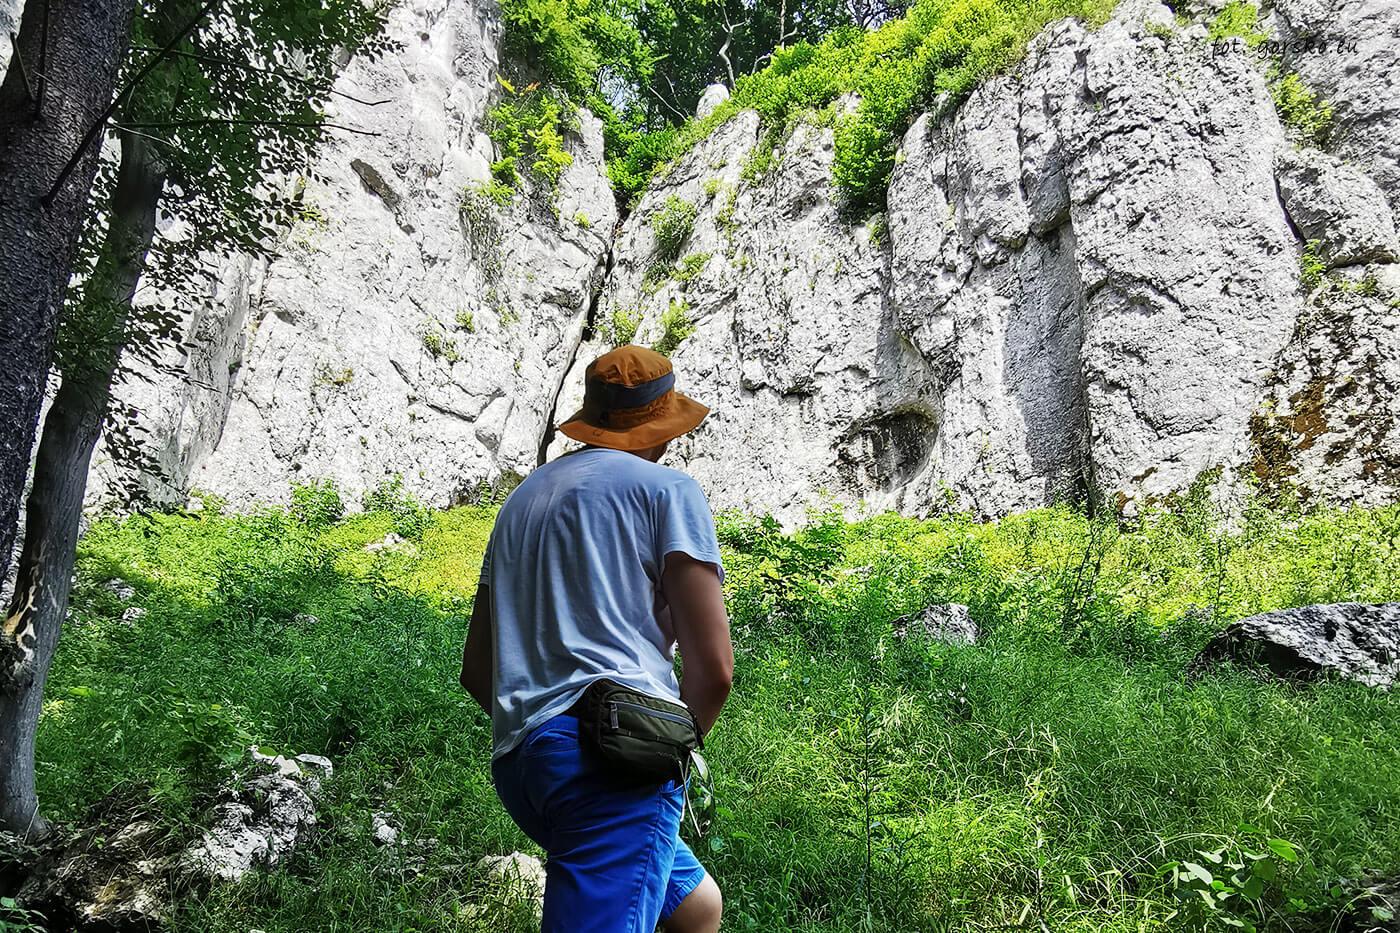 Kapelusz-turystyczny-Columbia-Bora-Bora-test-opinie